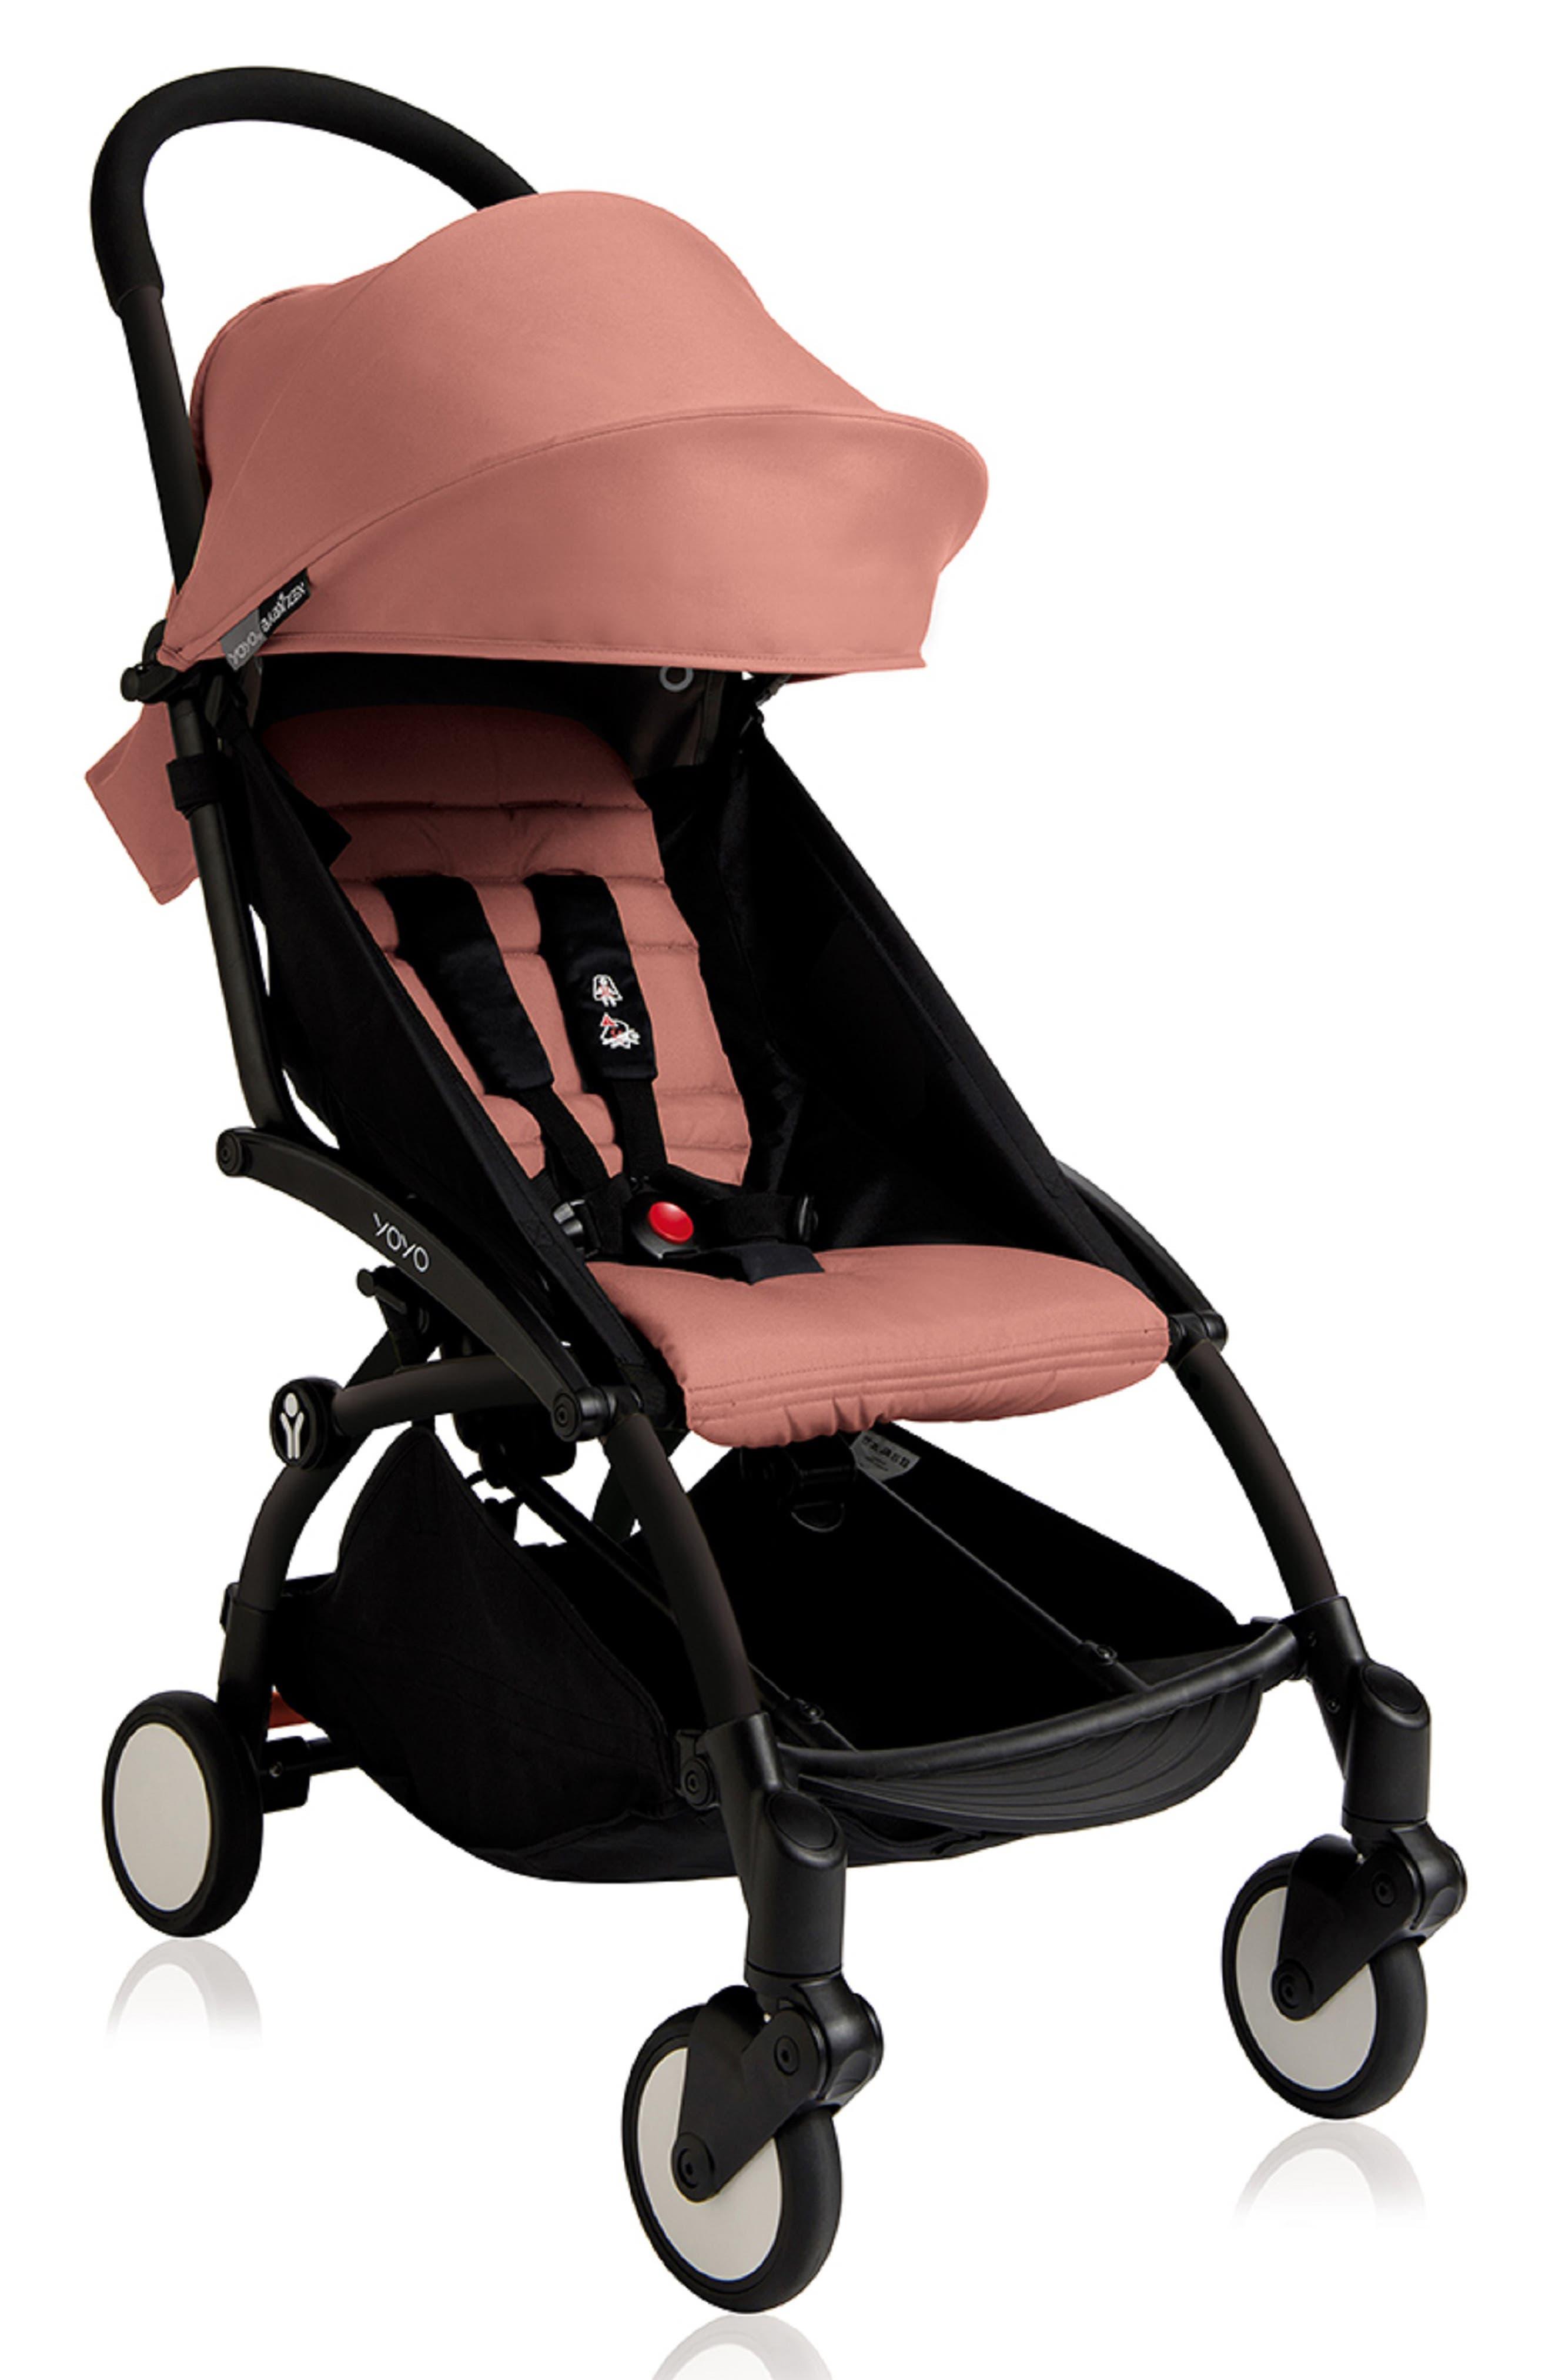 Infant Babyzen(TM) Yoyo Complete Stroller With Travel Bag Black Parasol  New Leg Rest Size One Size  Pink